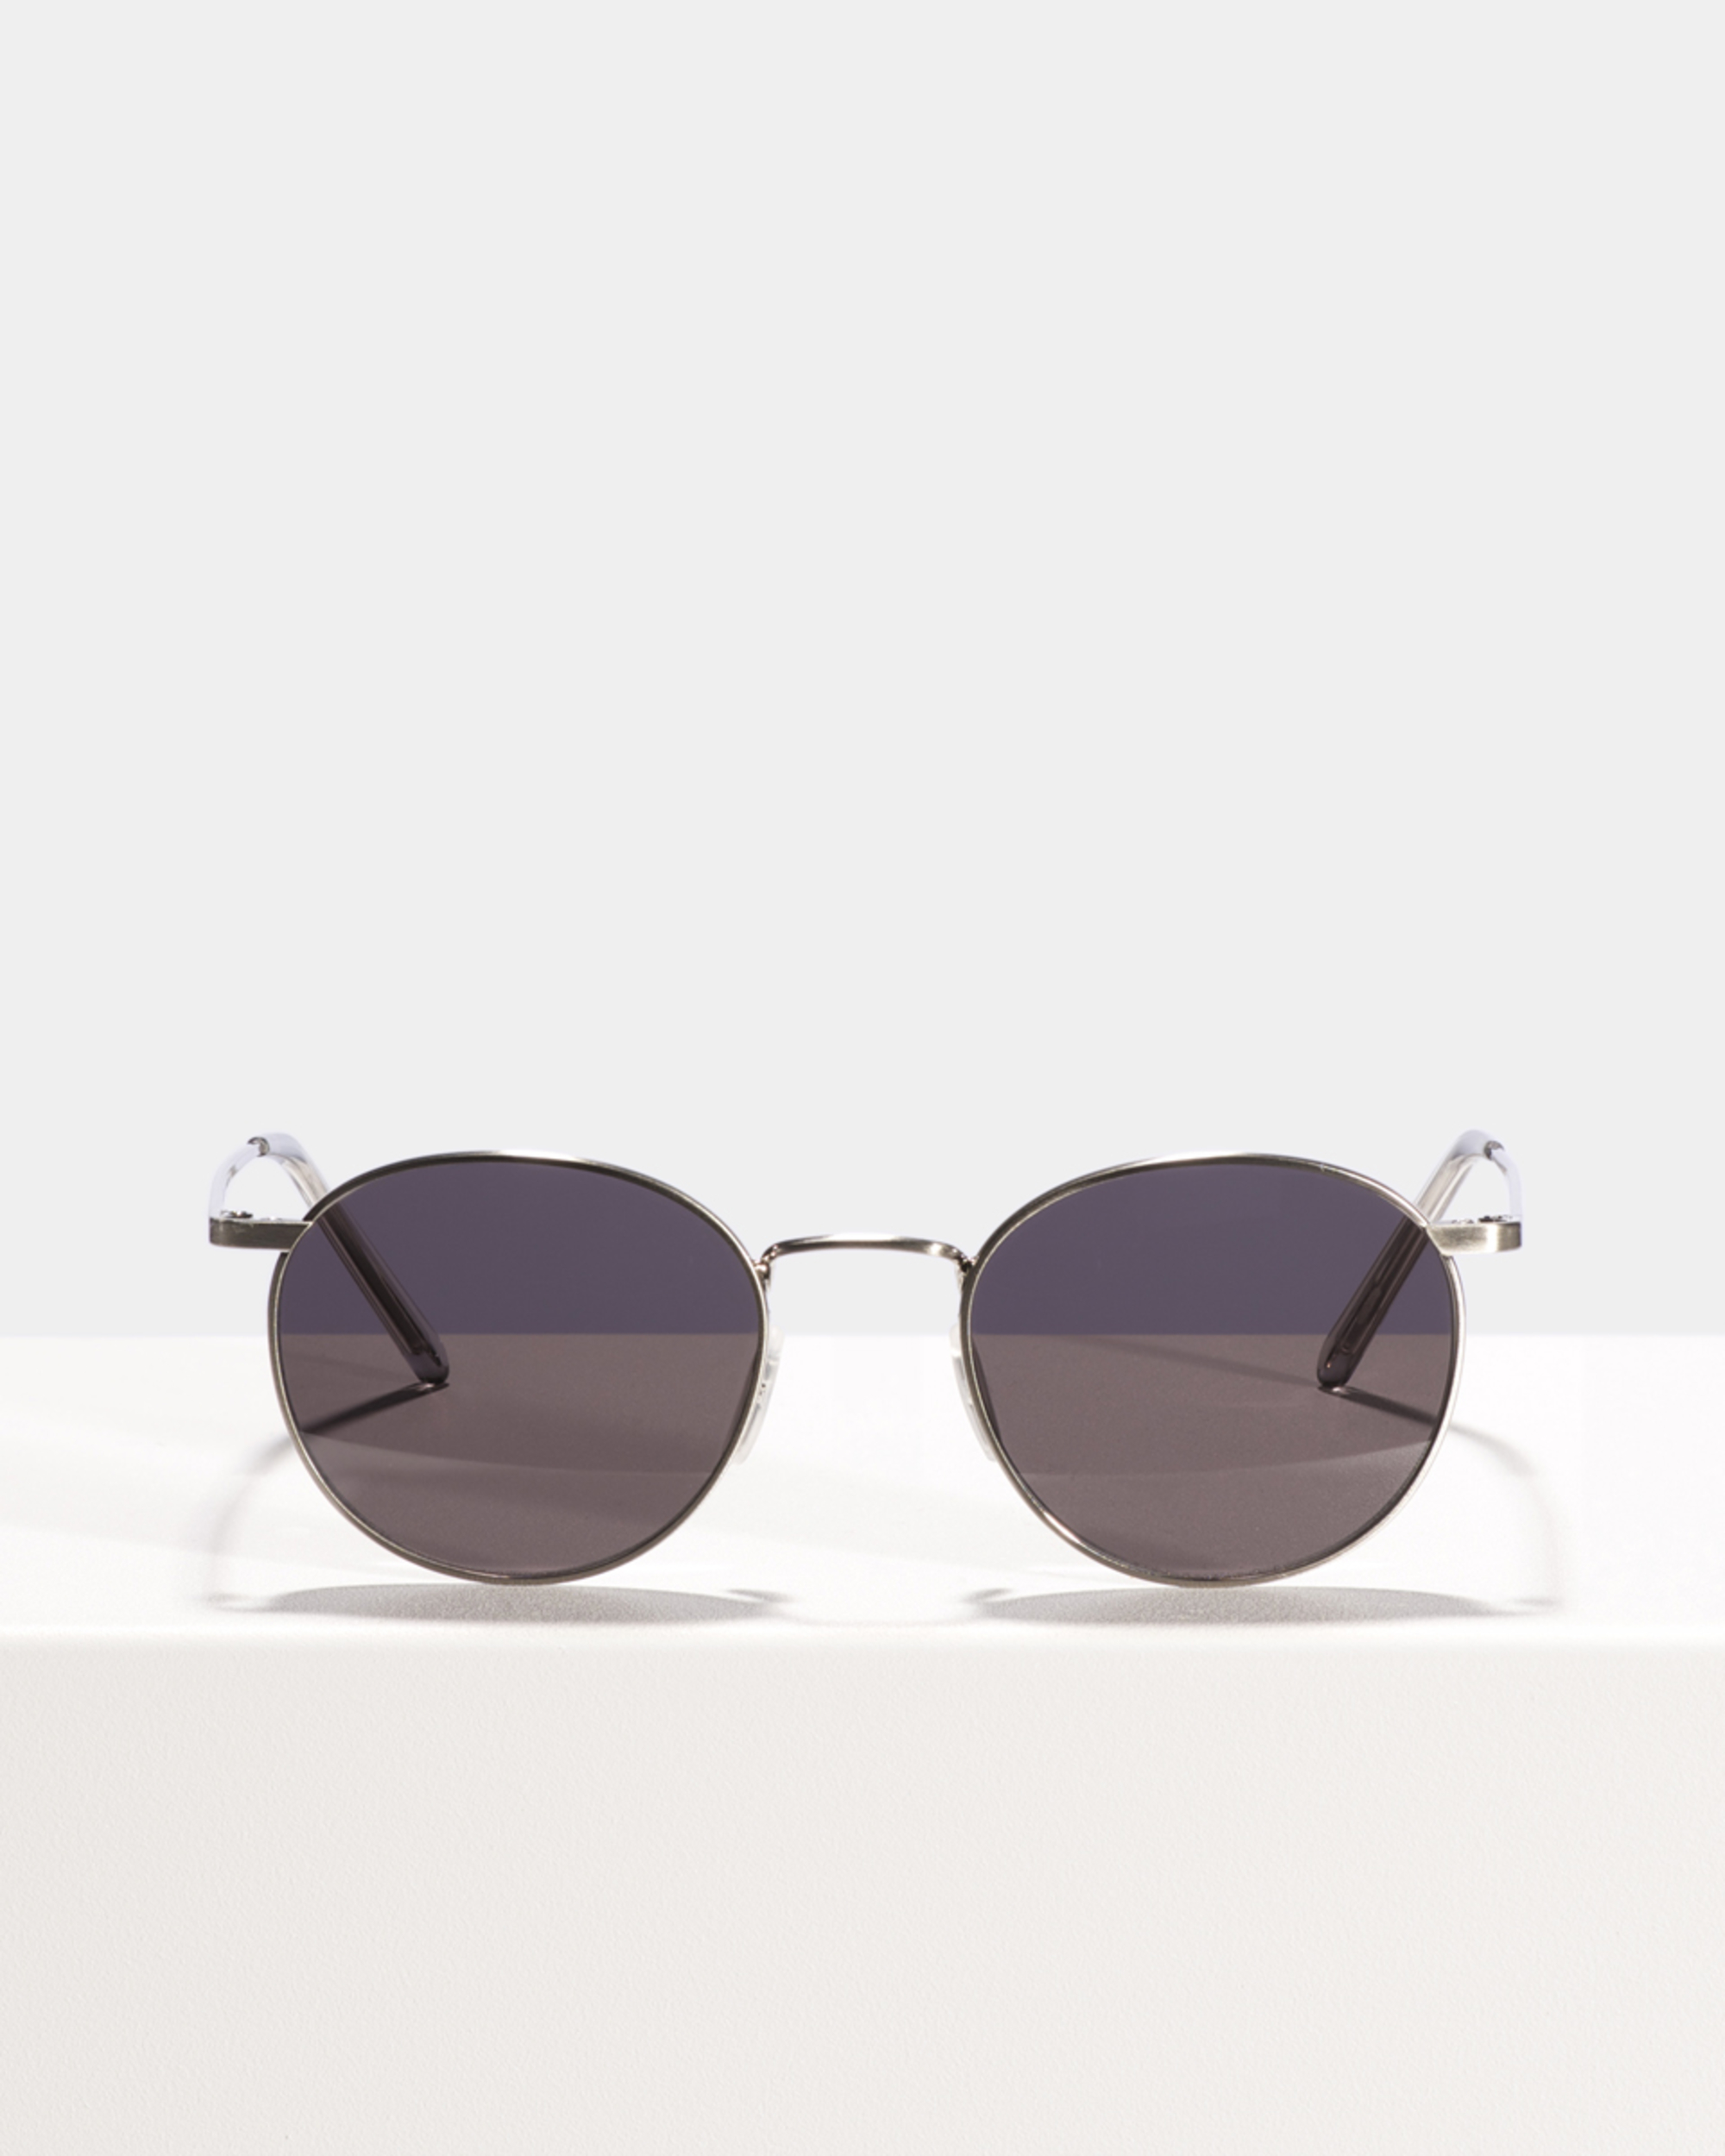 Ace & Tate Sunglasses | rund Metall in Silber